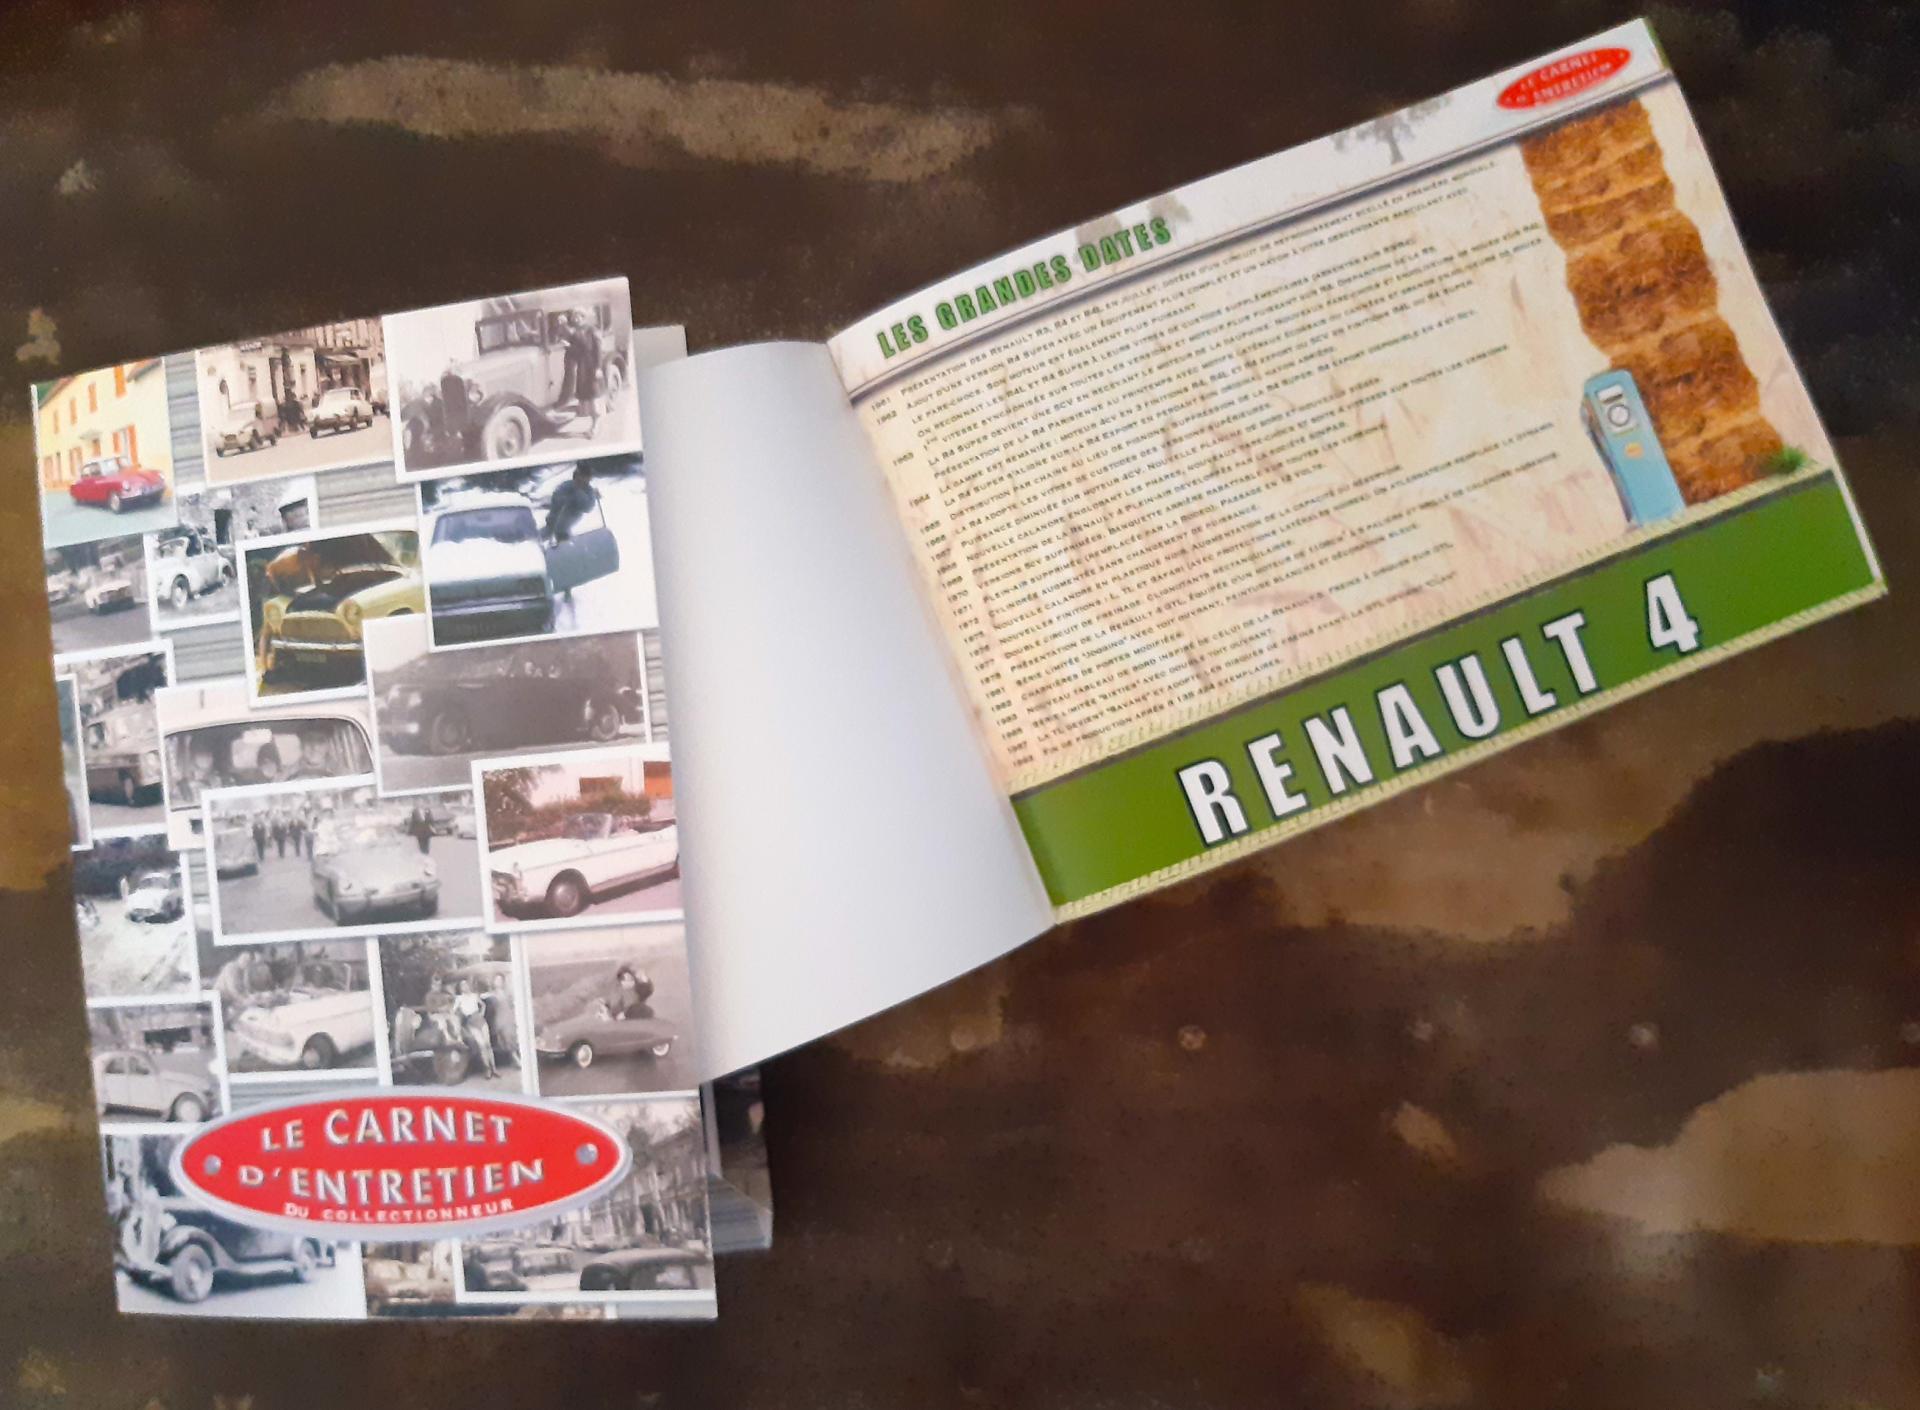 carnet d'entretien 4L / renault 4